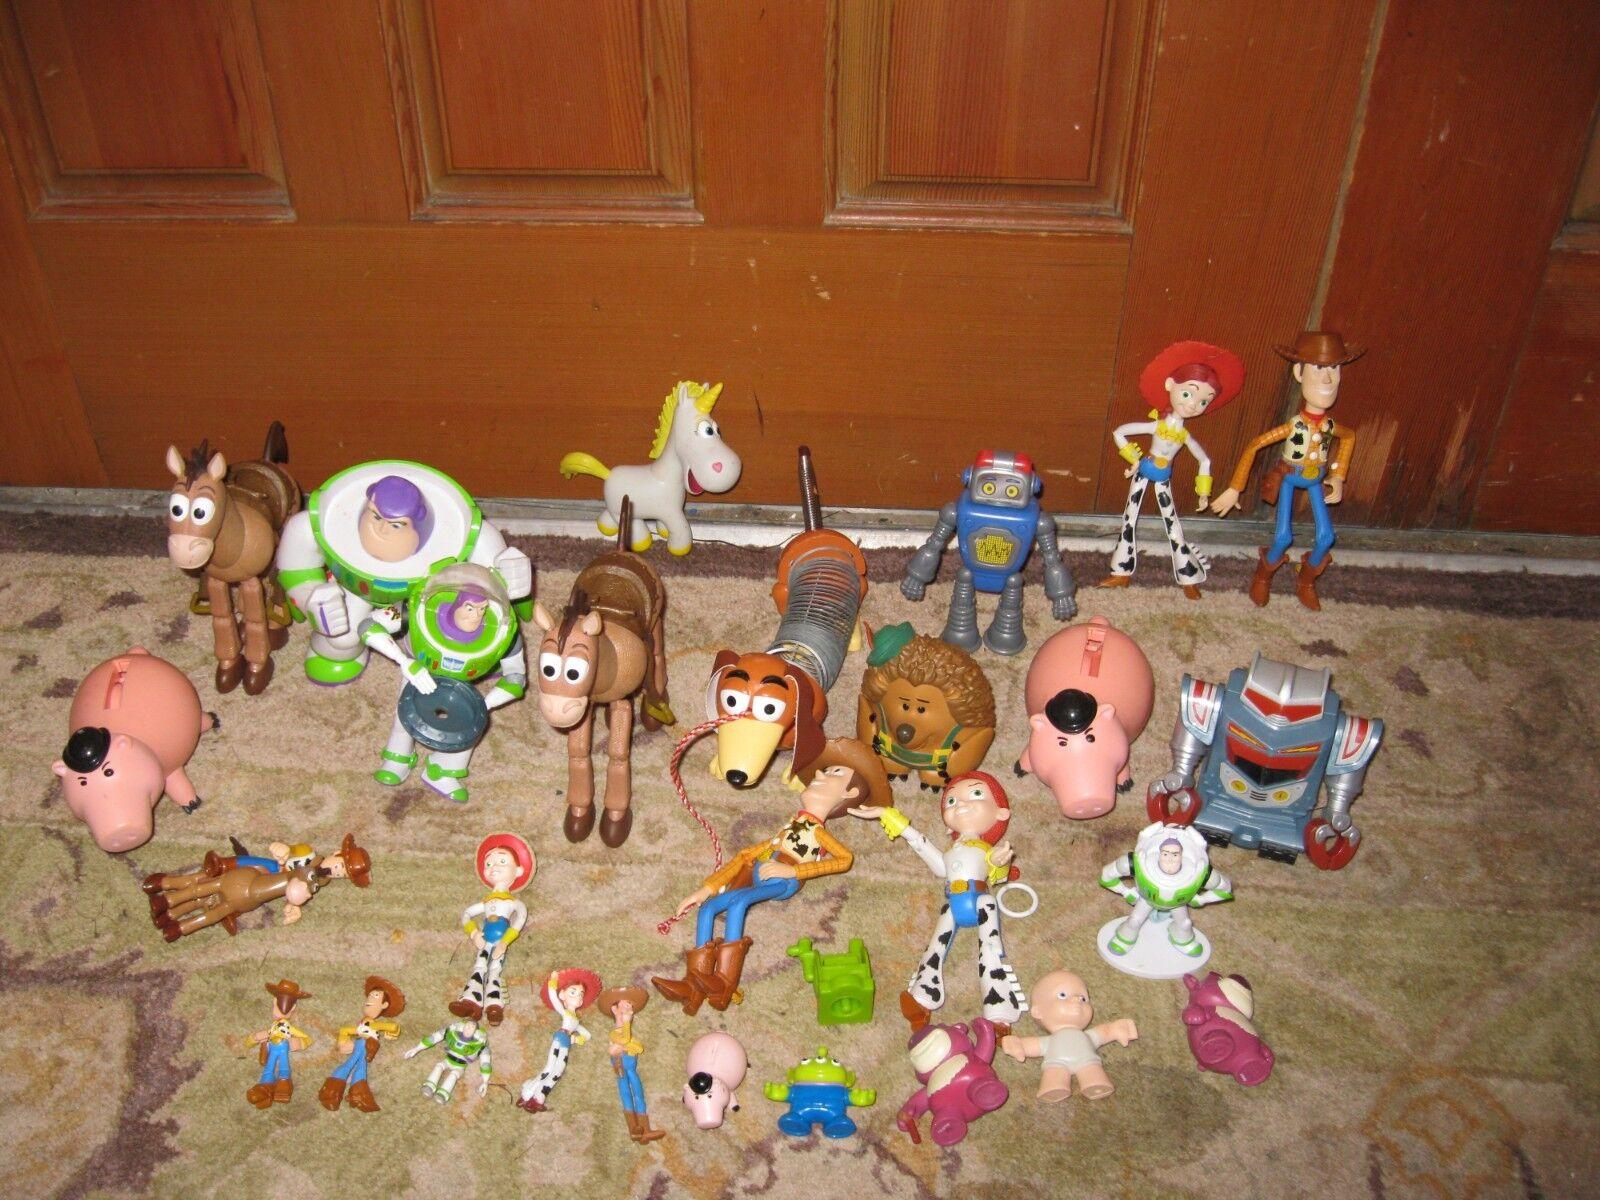 Toy Story Många leksaker Buzz ljuser träy Jessie Robot Lotso Action Figures